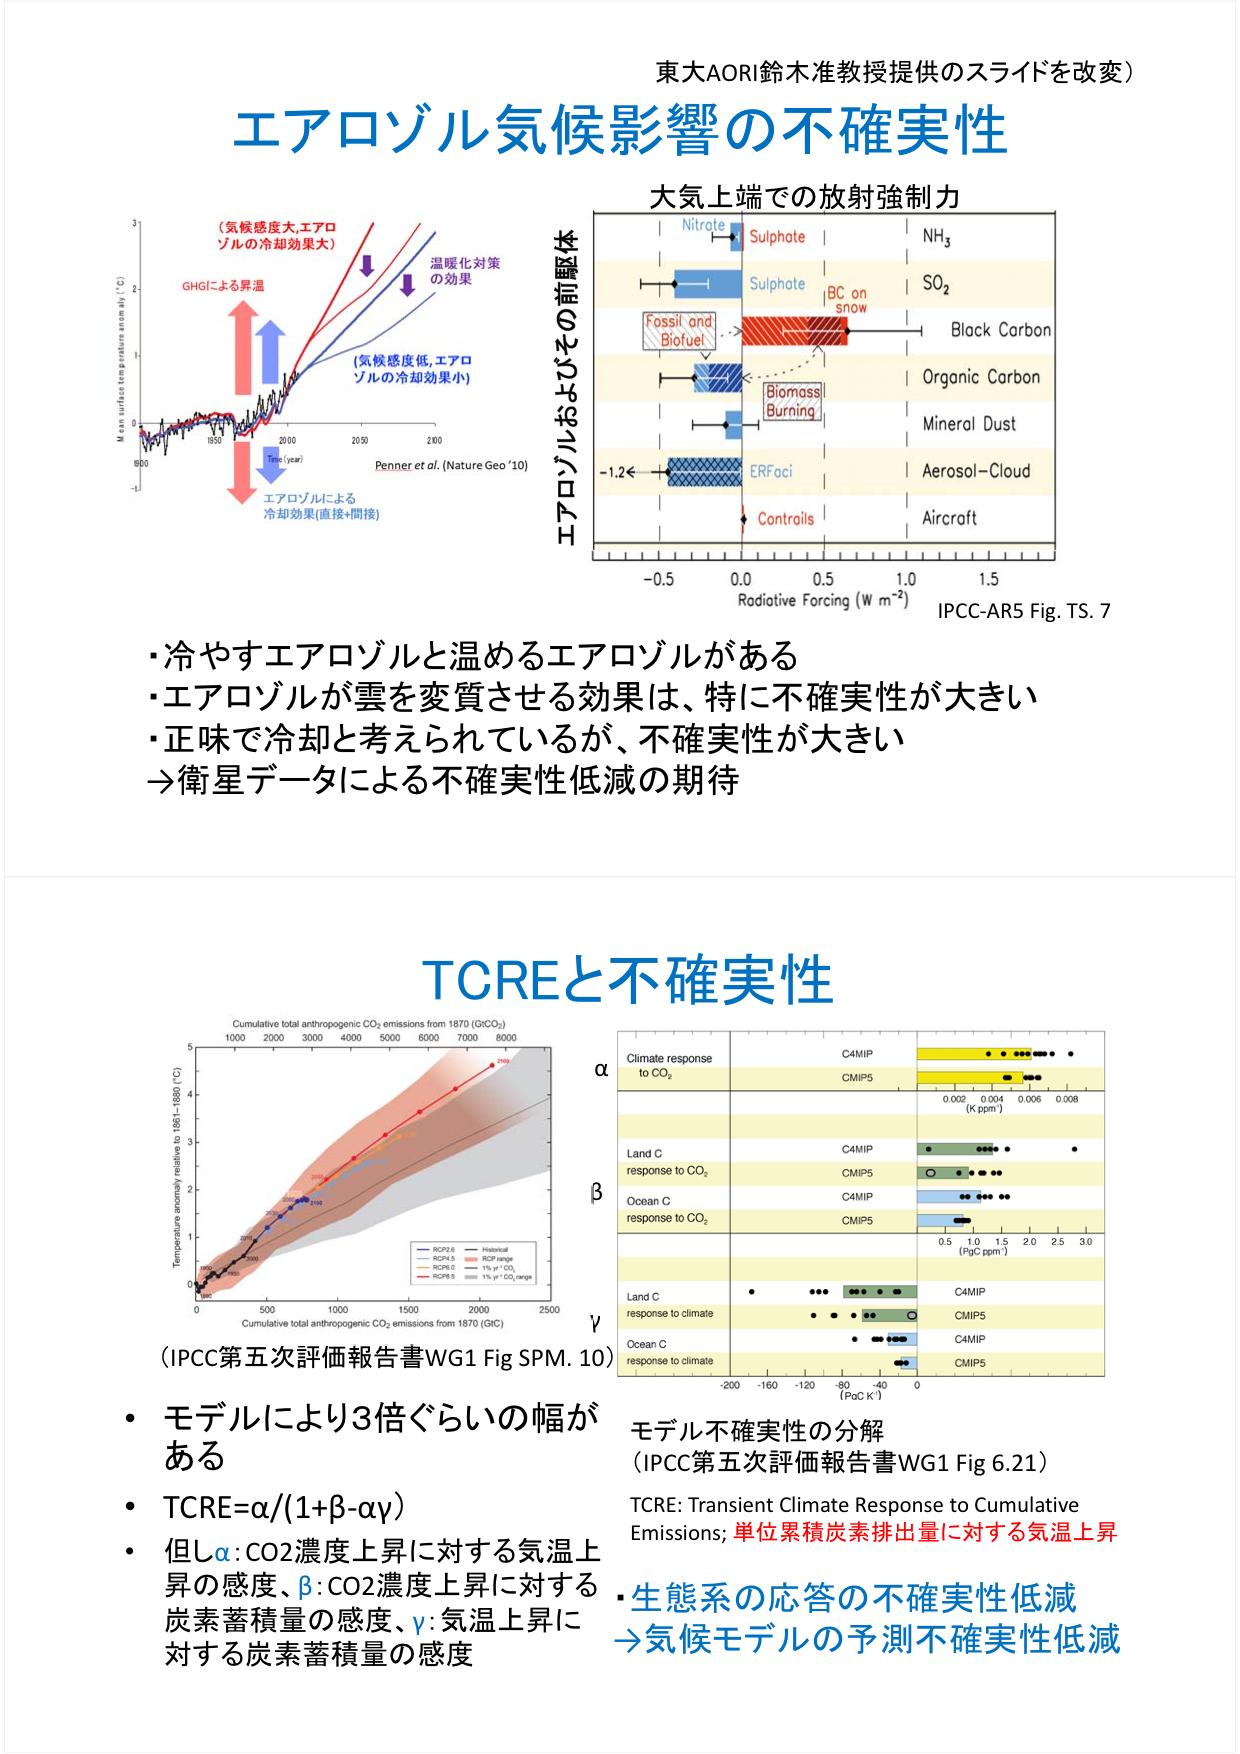 f:id:Imamura:20181220152520p:plain